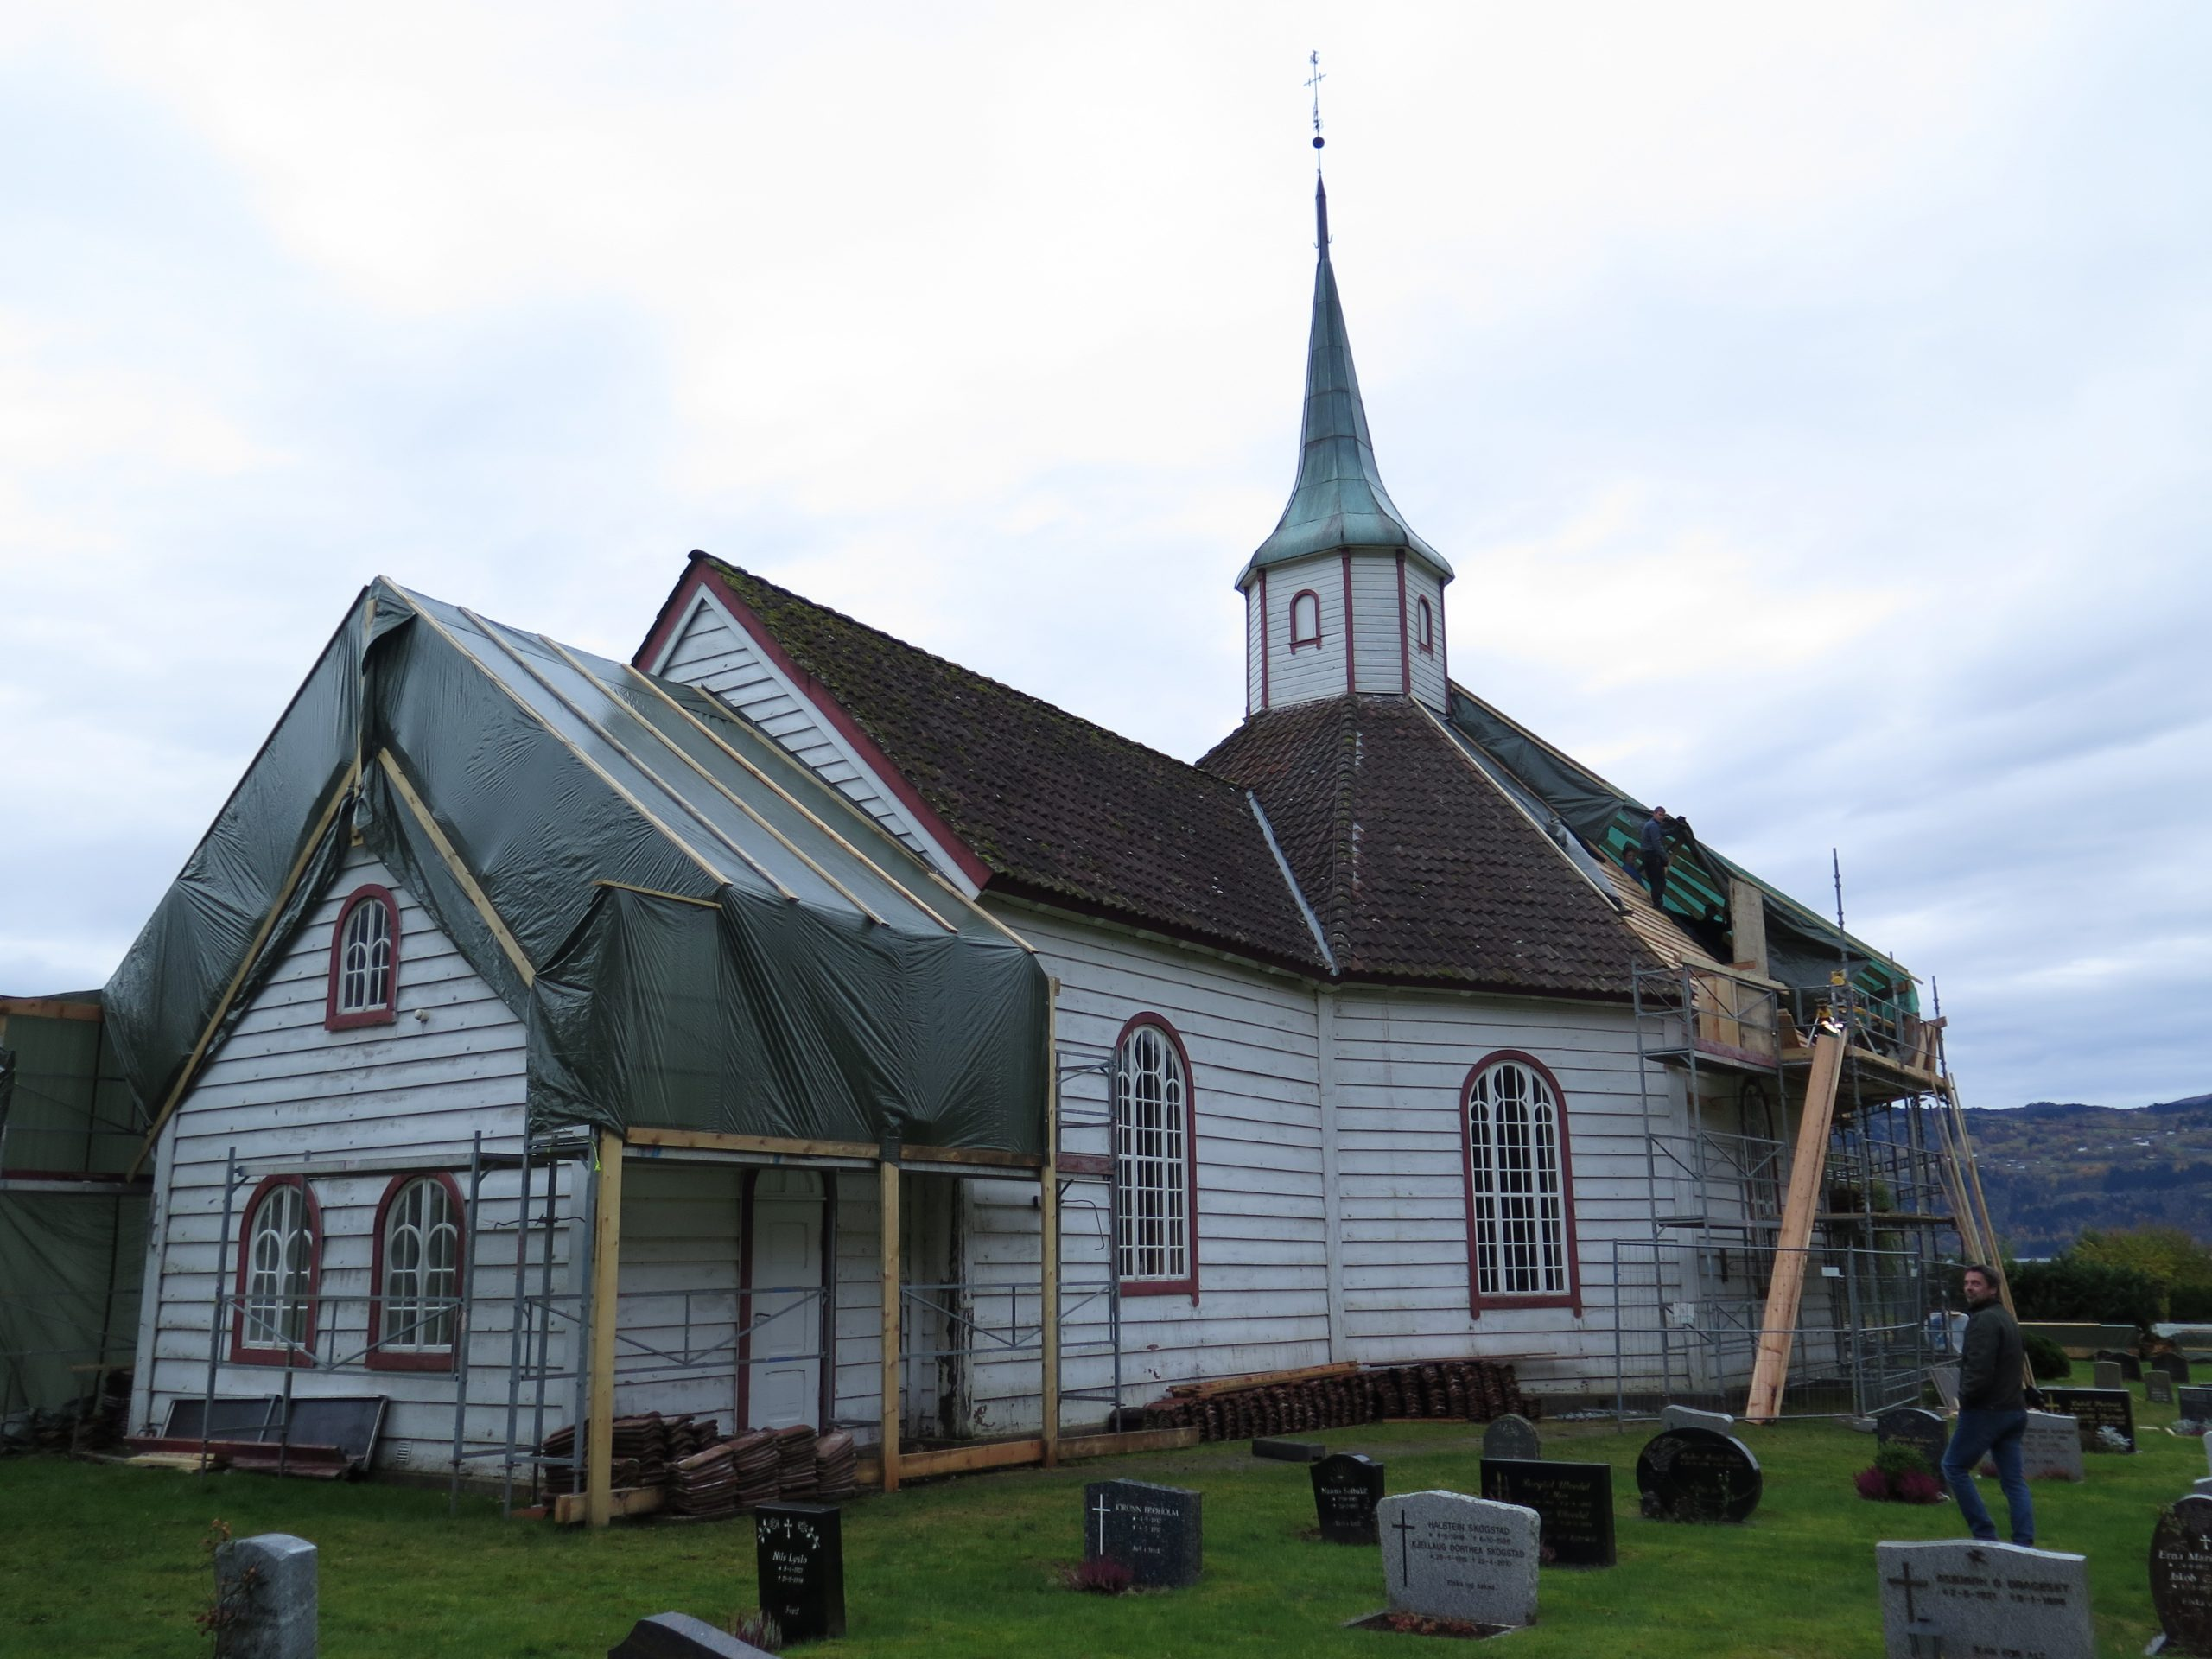 Bilde viser Innvik kirke i Stryn, Sogn og Fjordane. Fotograf er Ingeborg Magerøy